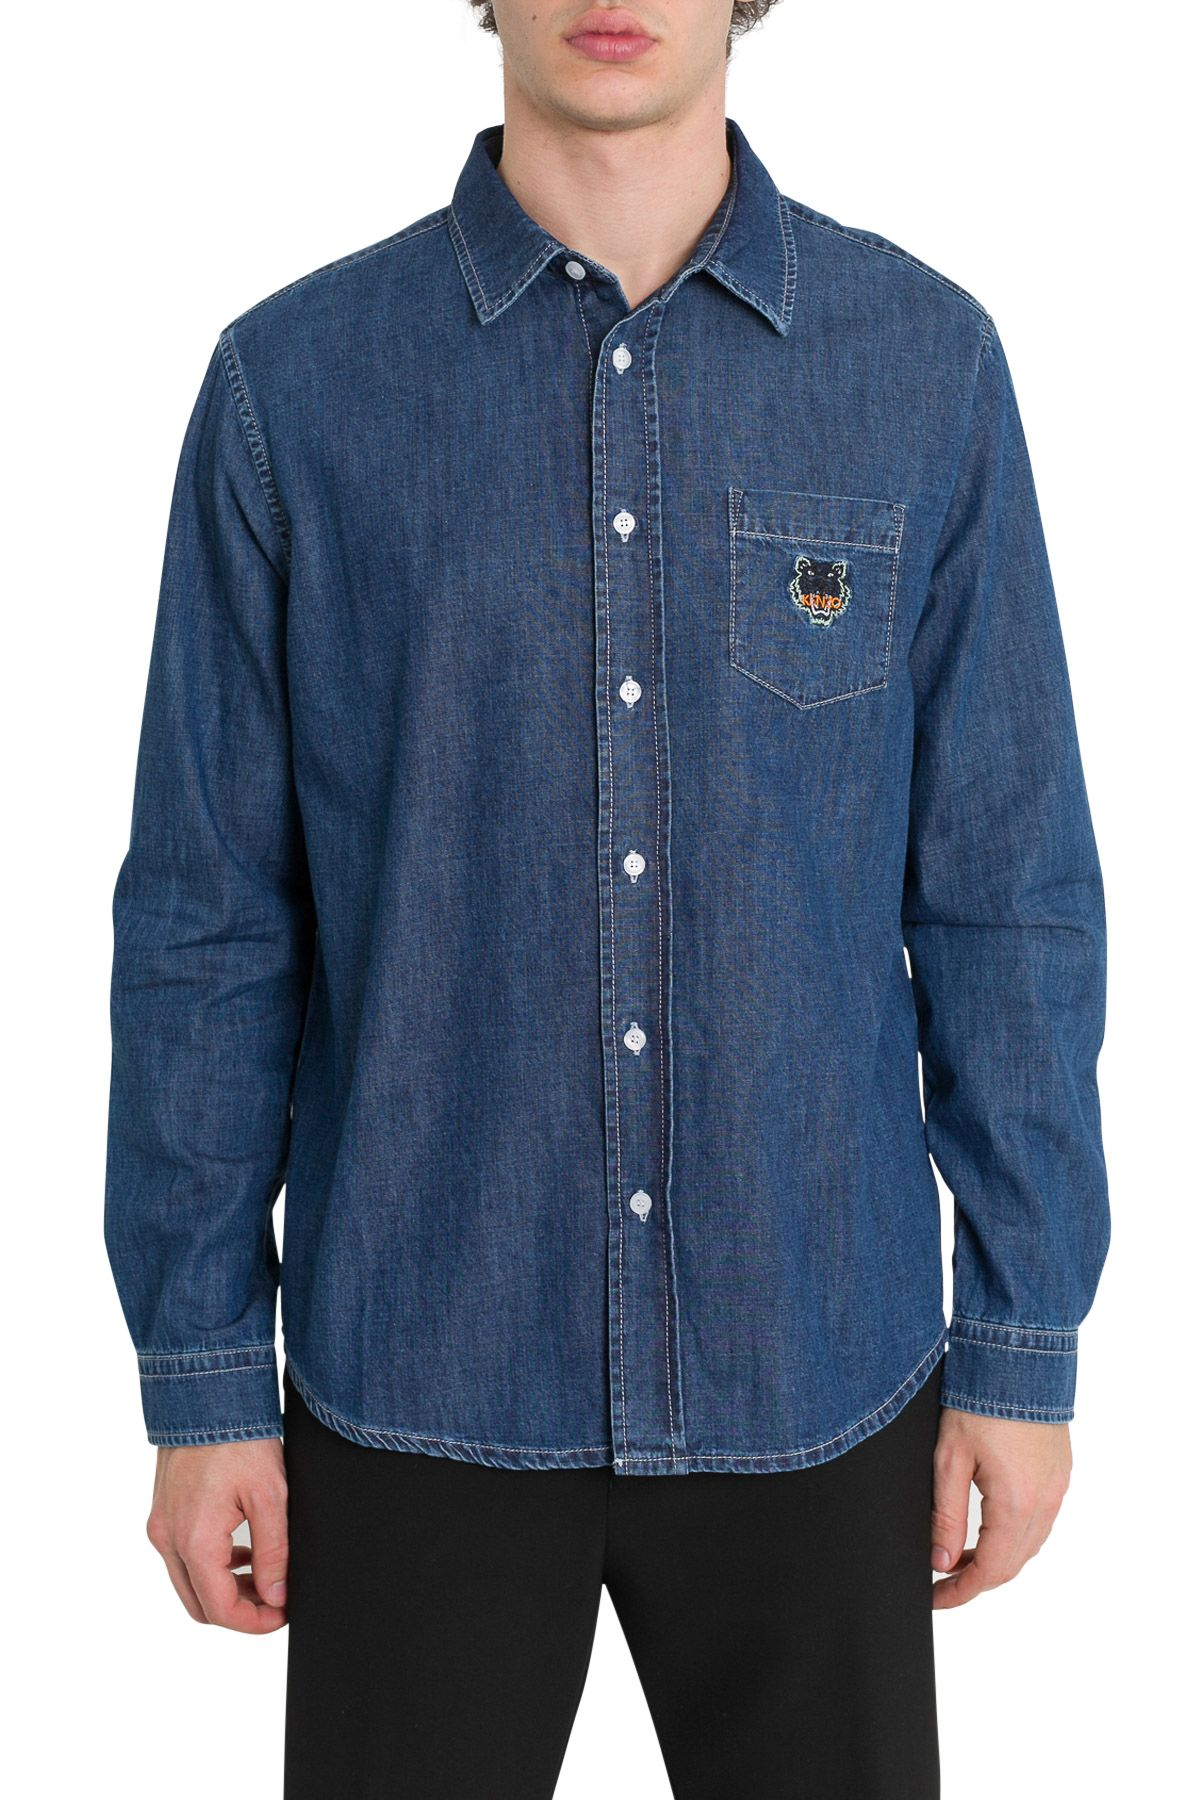 783ce5dc3f Kenzo Kenzo Tiger Embroidered Denim Shirt - Blue - 10803455